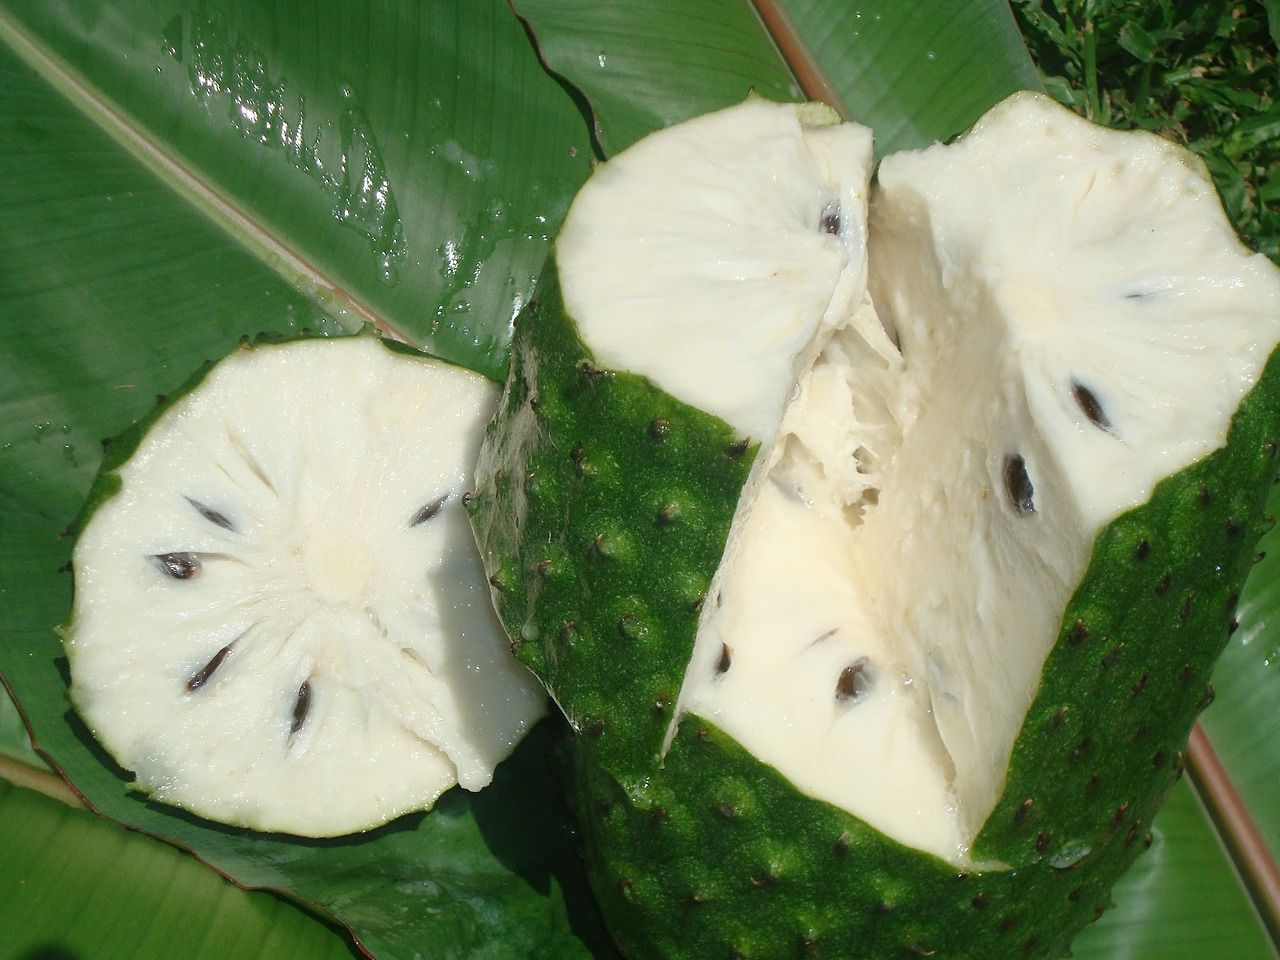 melaninamami: yazzyshakur: zay4ik: guanabana this fruit tastes ...